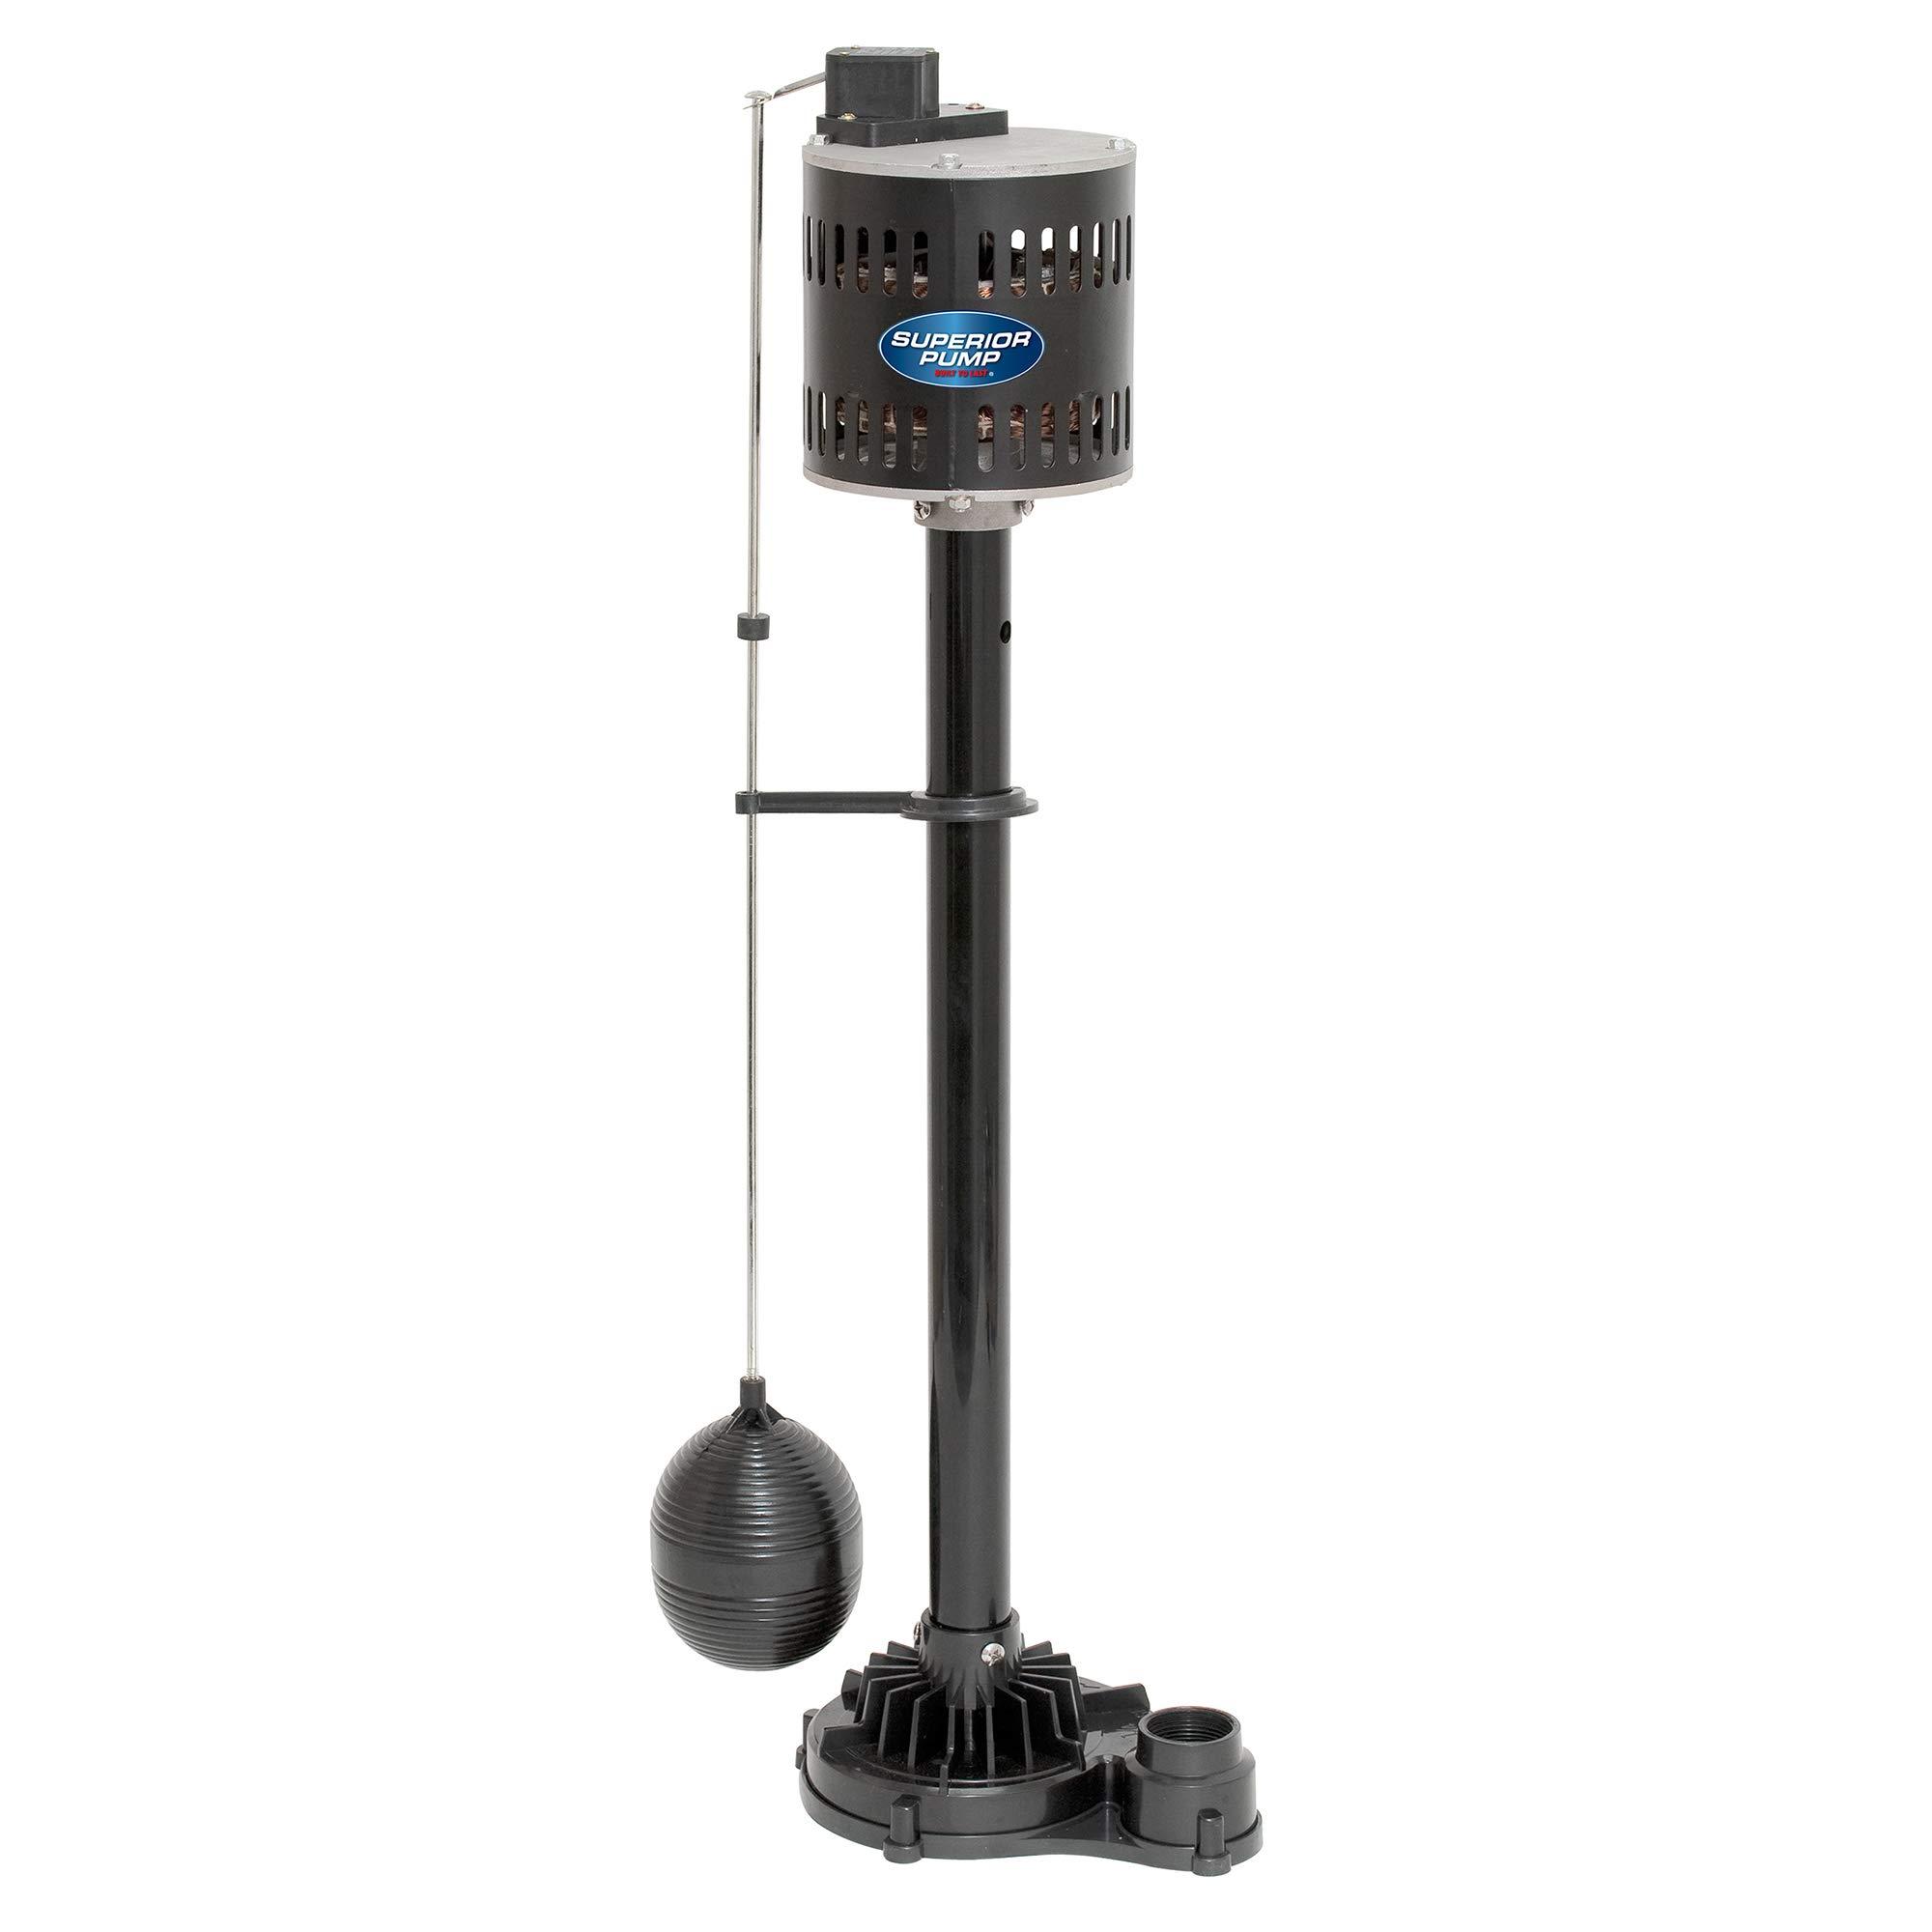 Superior Pump 92333 1/3 HP Thermoplastic Pedestal Sump Pump, Black by Superior Pump